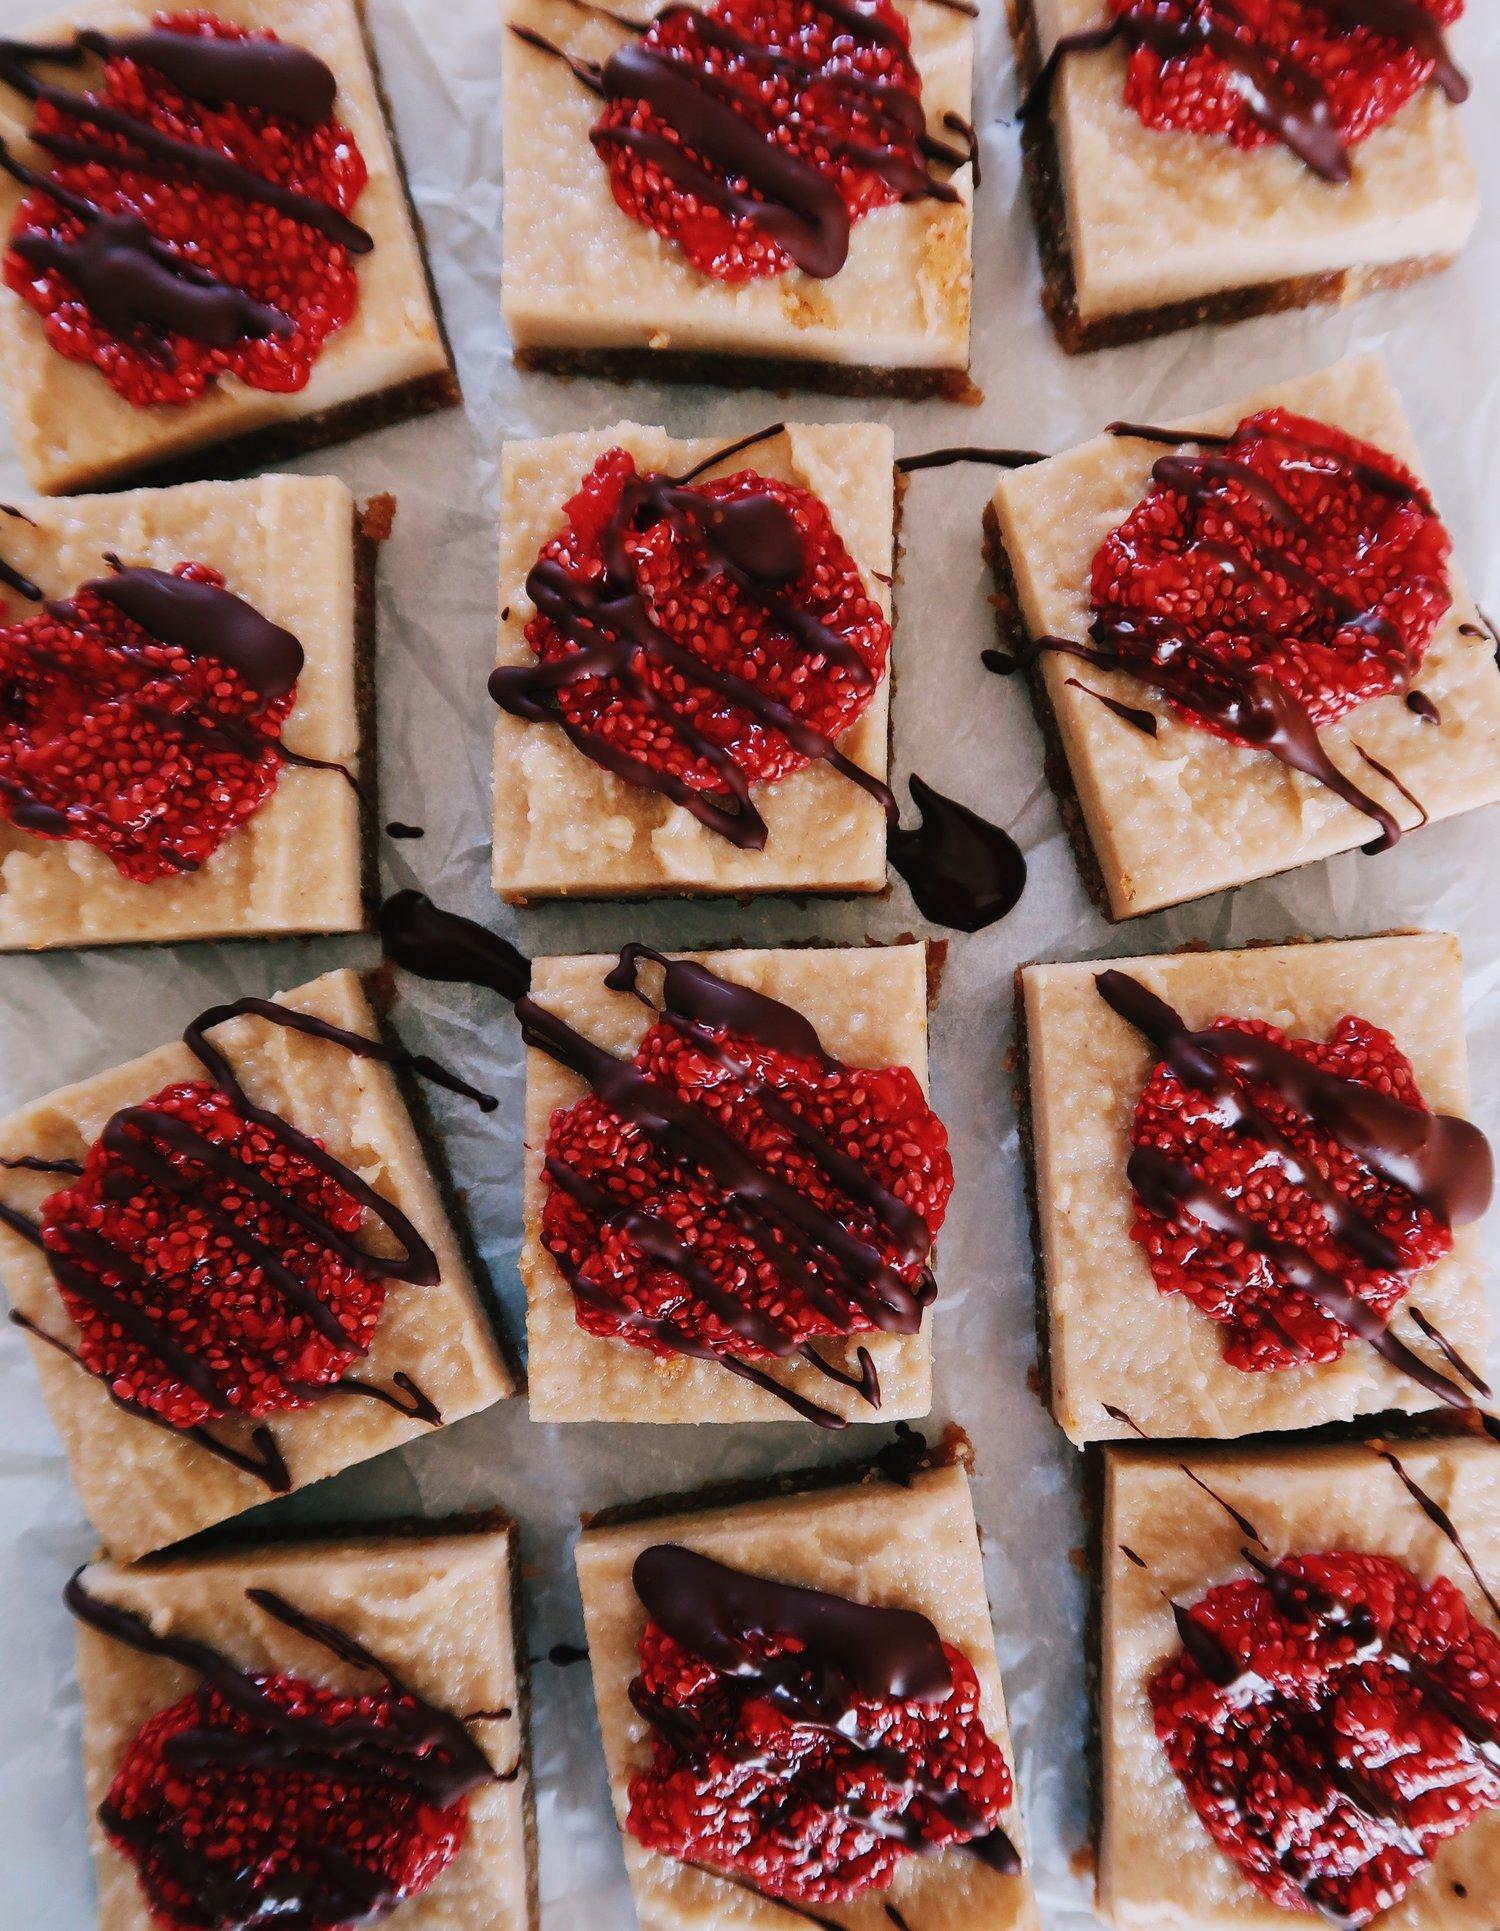 hu-chocolate-paleo-raspberry-cheesecake-bars.jpg